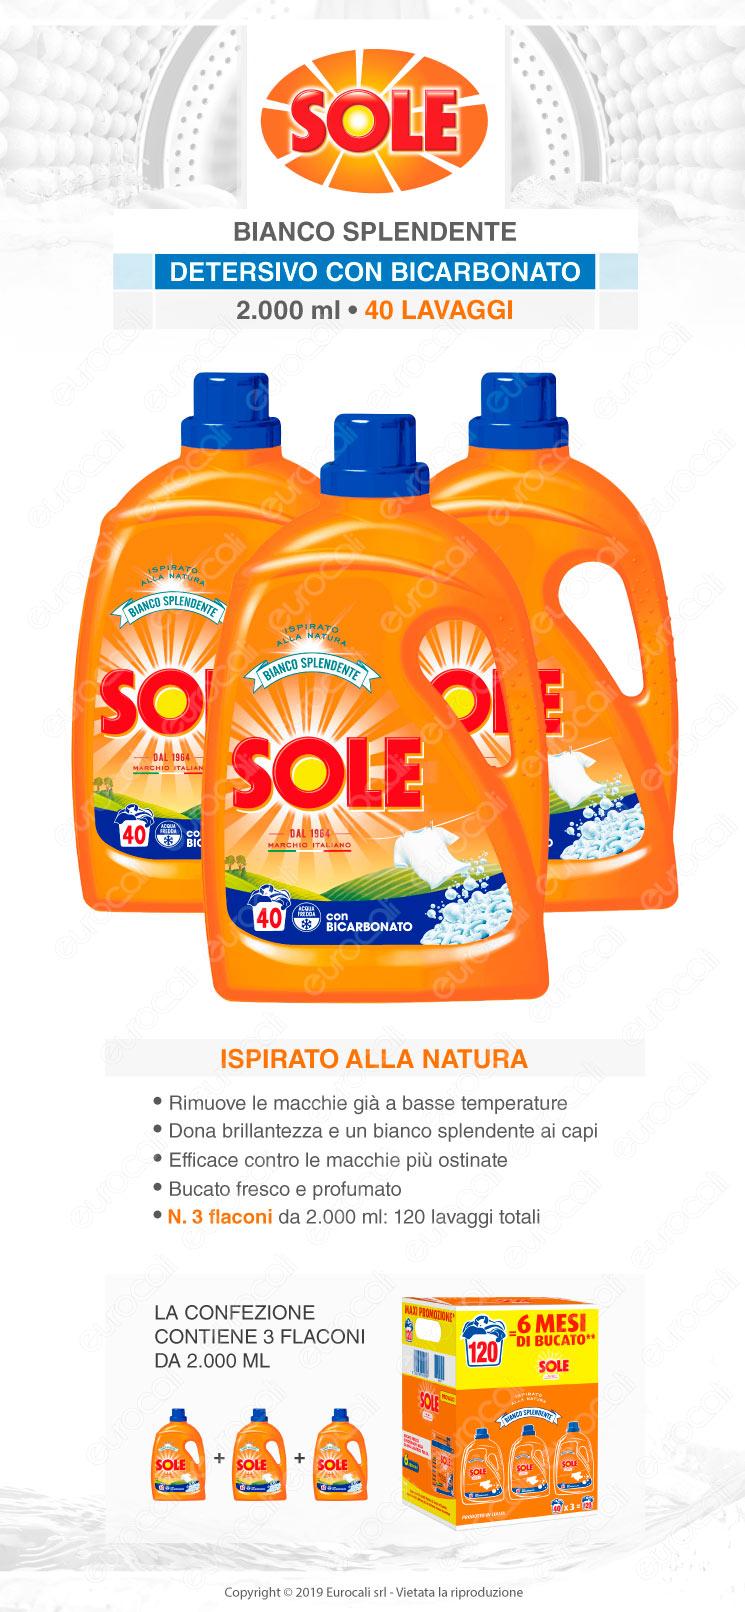 Kit Risparmio Sole Bianco Splendente Detersivo Liquido per Lavatrice - 3 flaconi da 2000ml